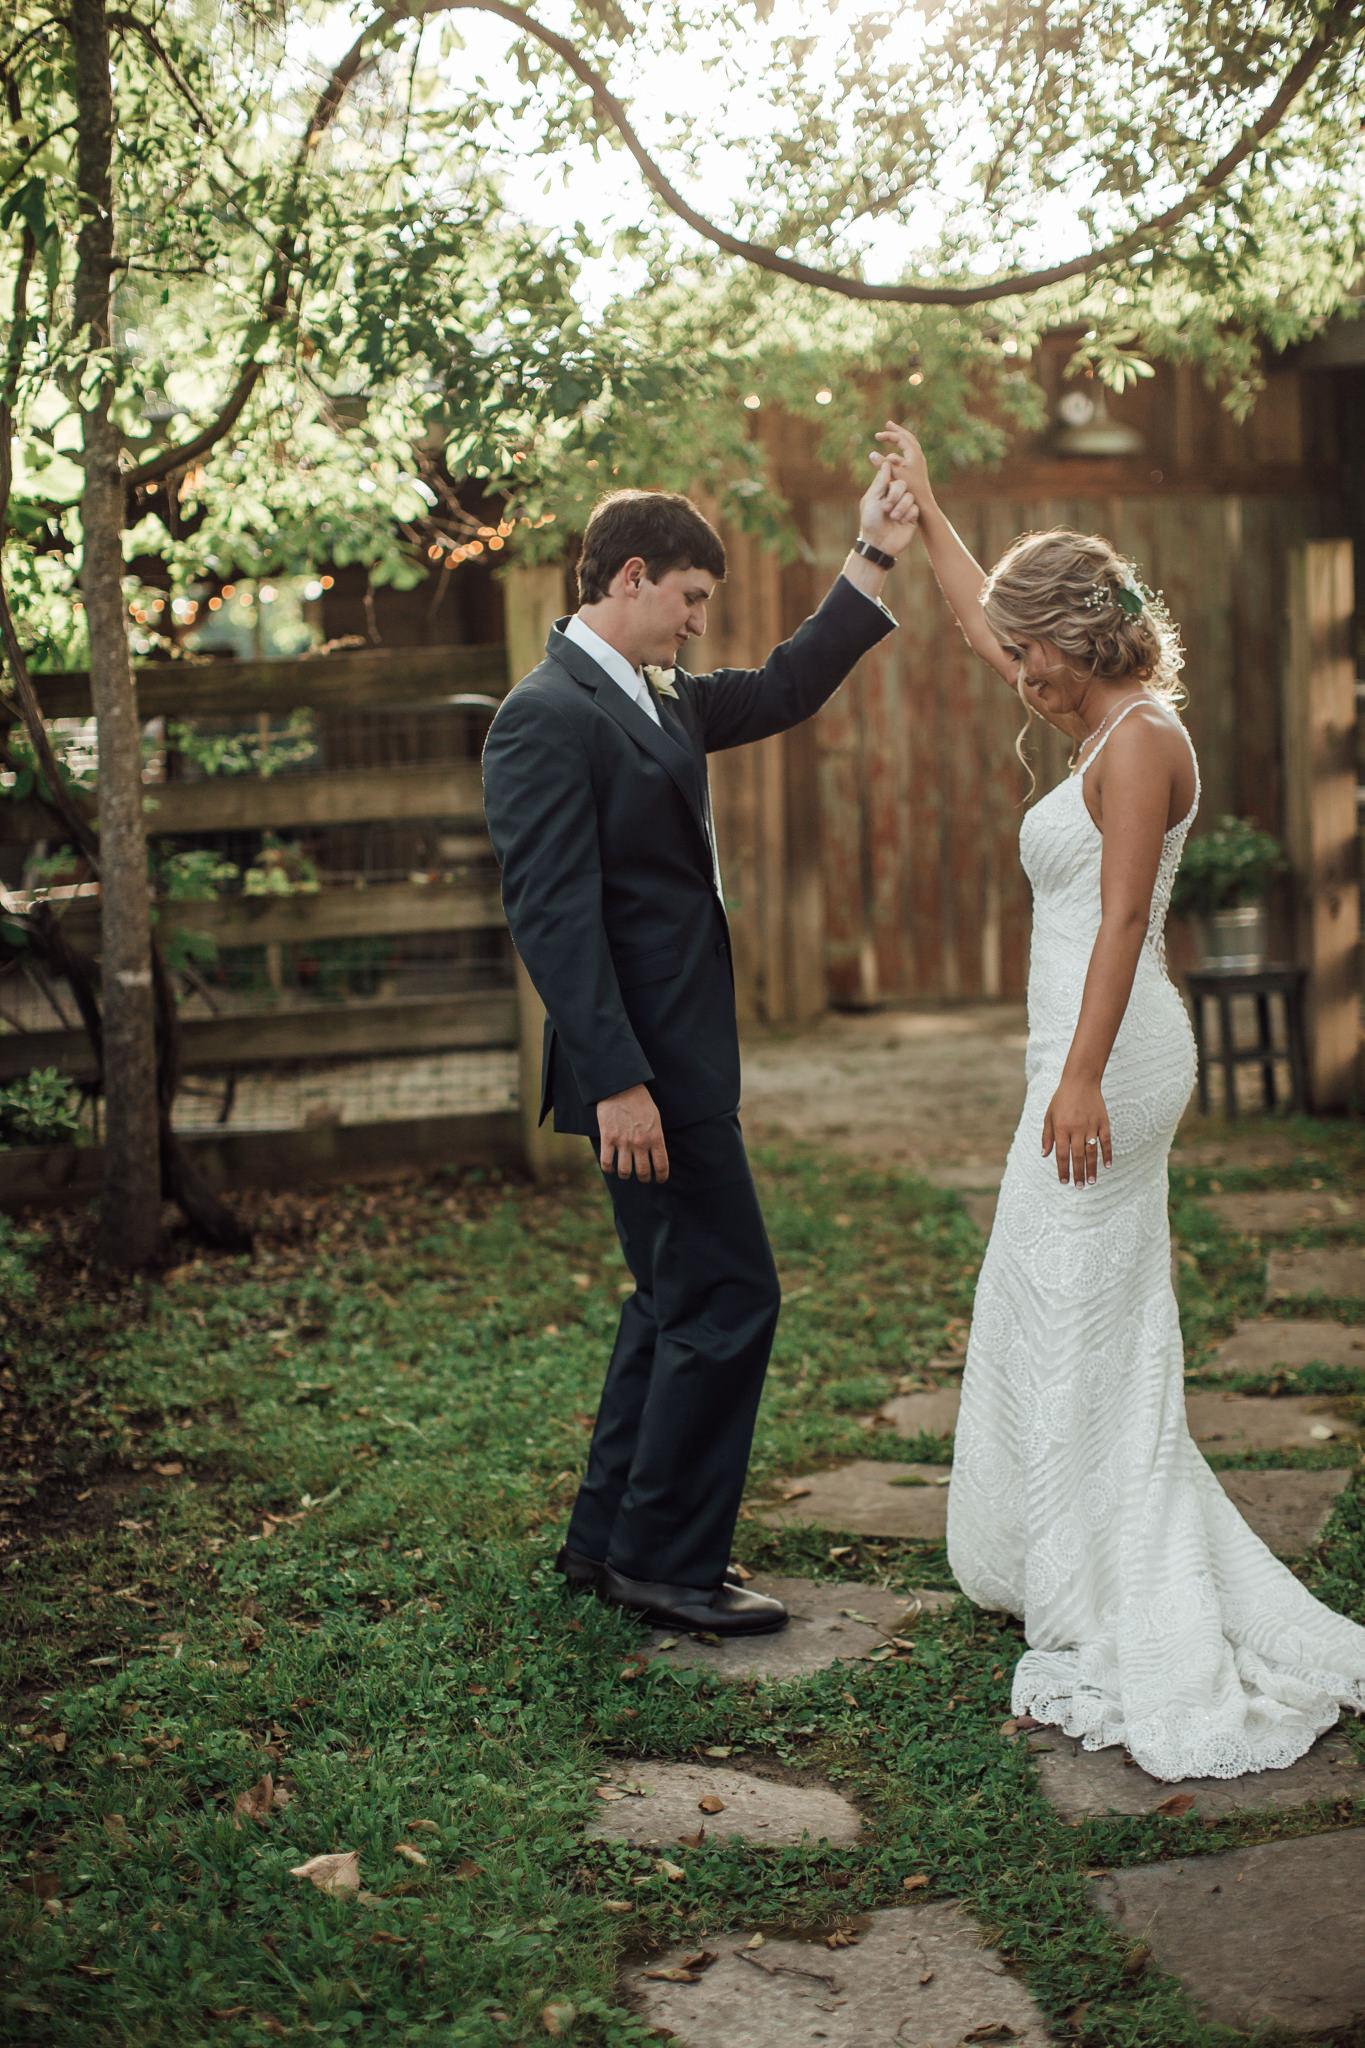 cassie-cook-photography-memphis-wedding-photographer-hedge-farm-wedding-venue-214.jpg